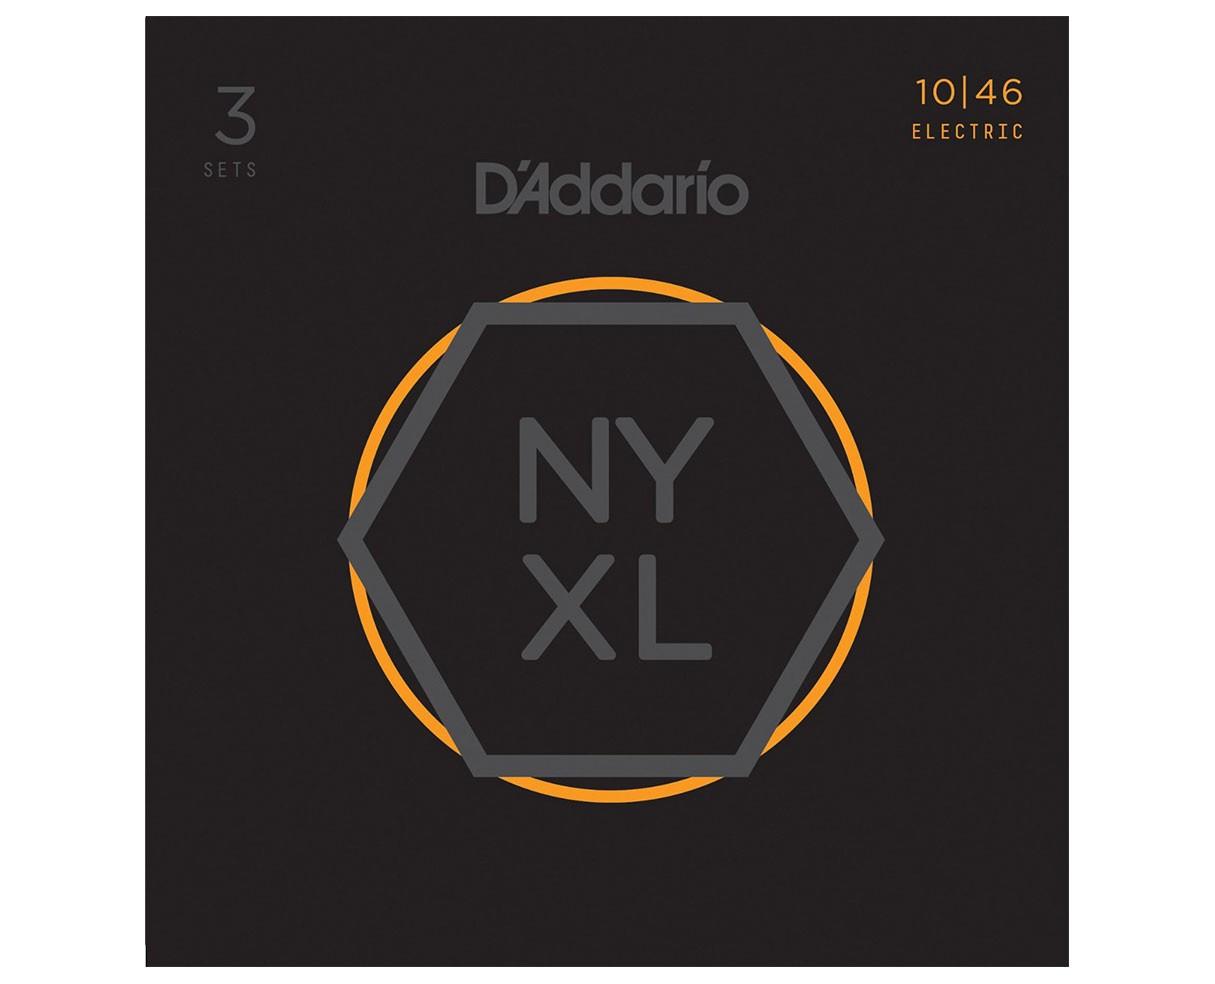 D'Addario NYXL1046-3P Nickel Wound, Regular Light, 10-46 3-pack